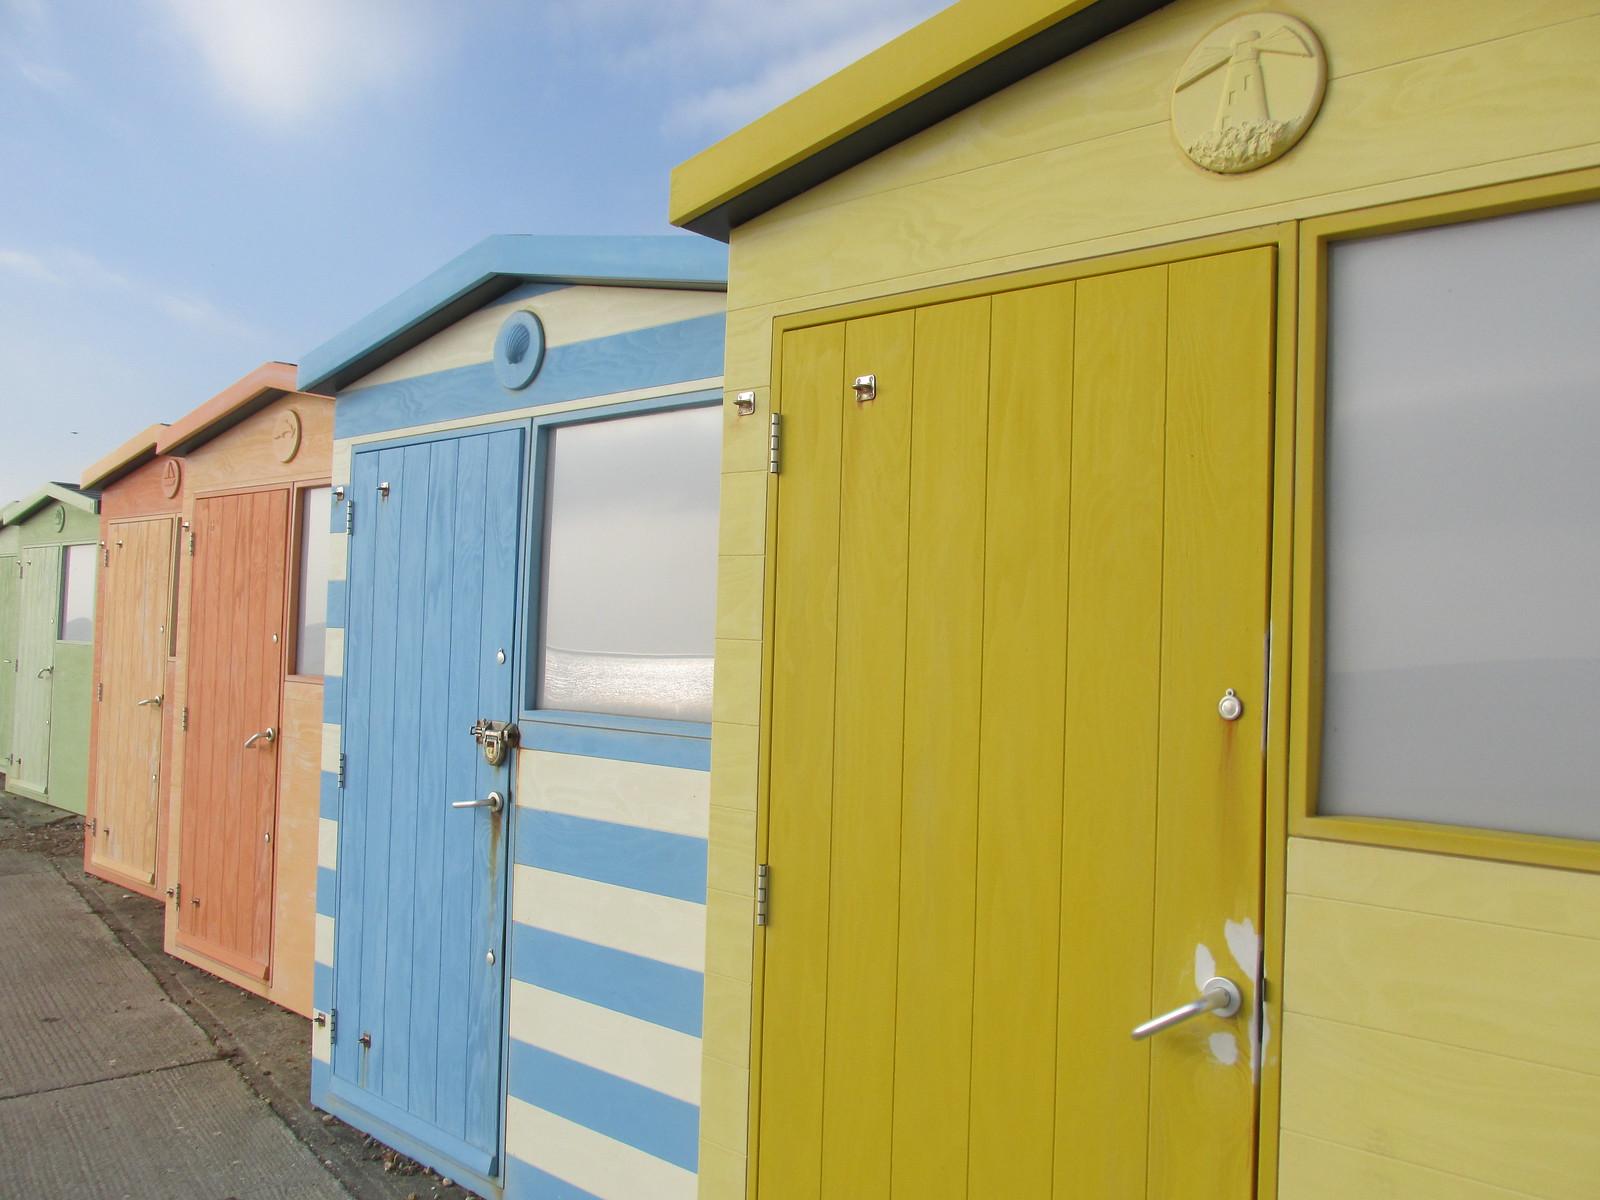 April 6, 2015: Glynde to Seaford Seaford beach huts